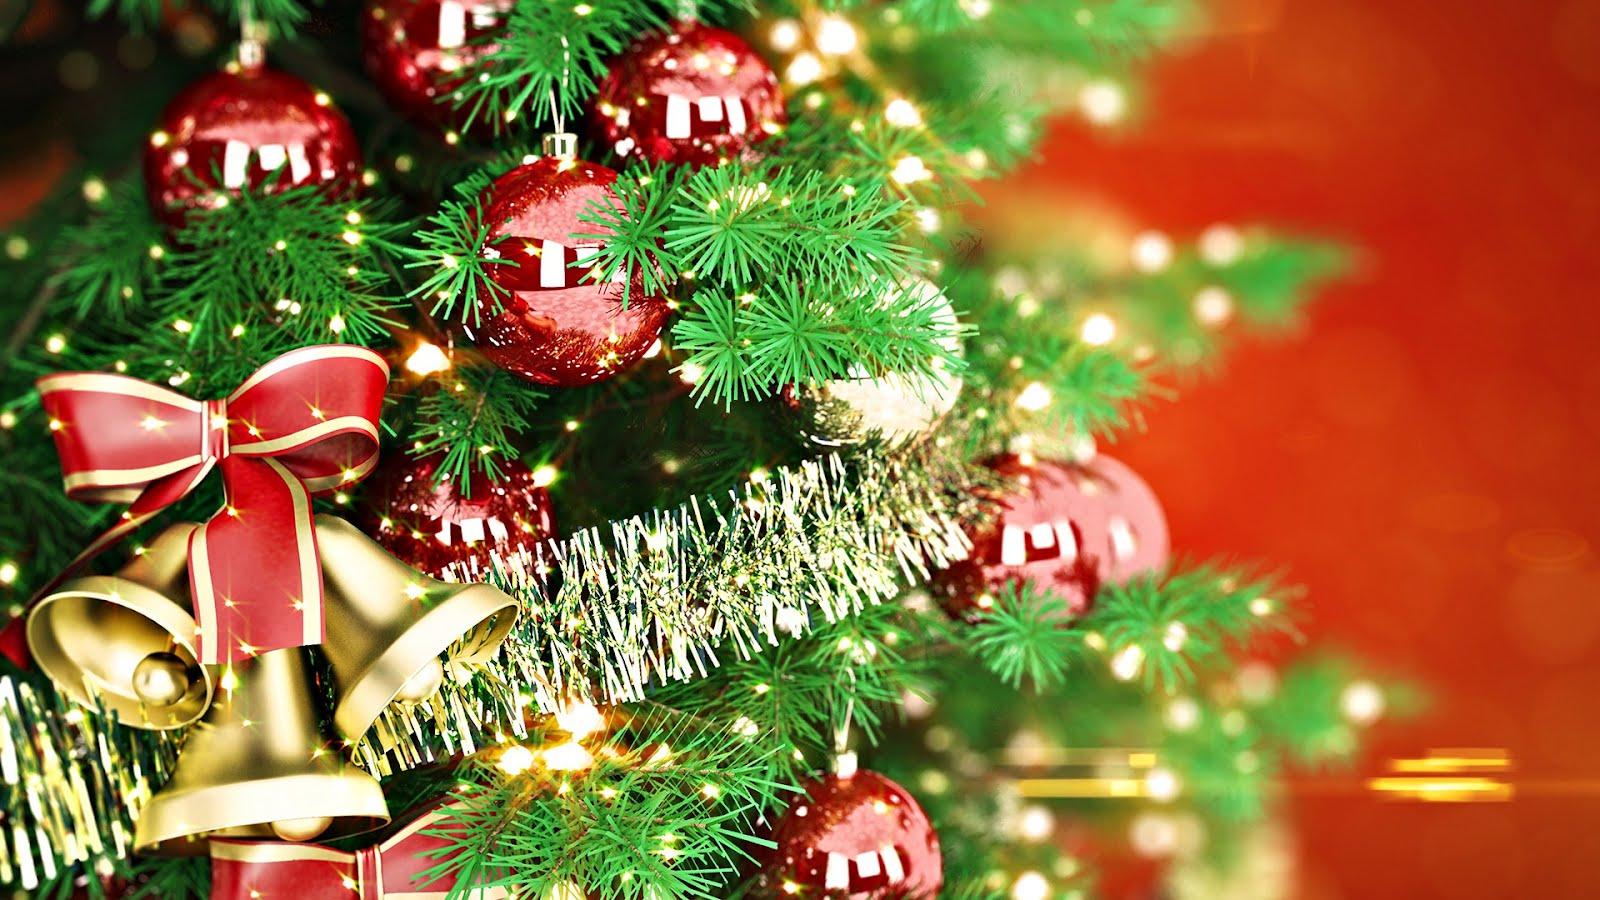 christmas tree desktop wallpaper 1280x1024 - photo #30